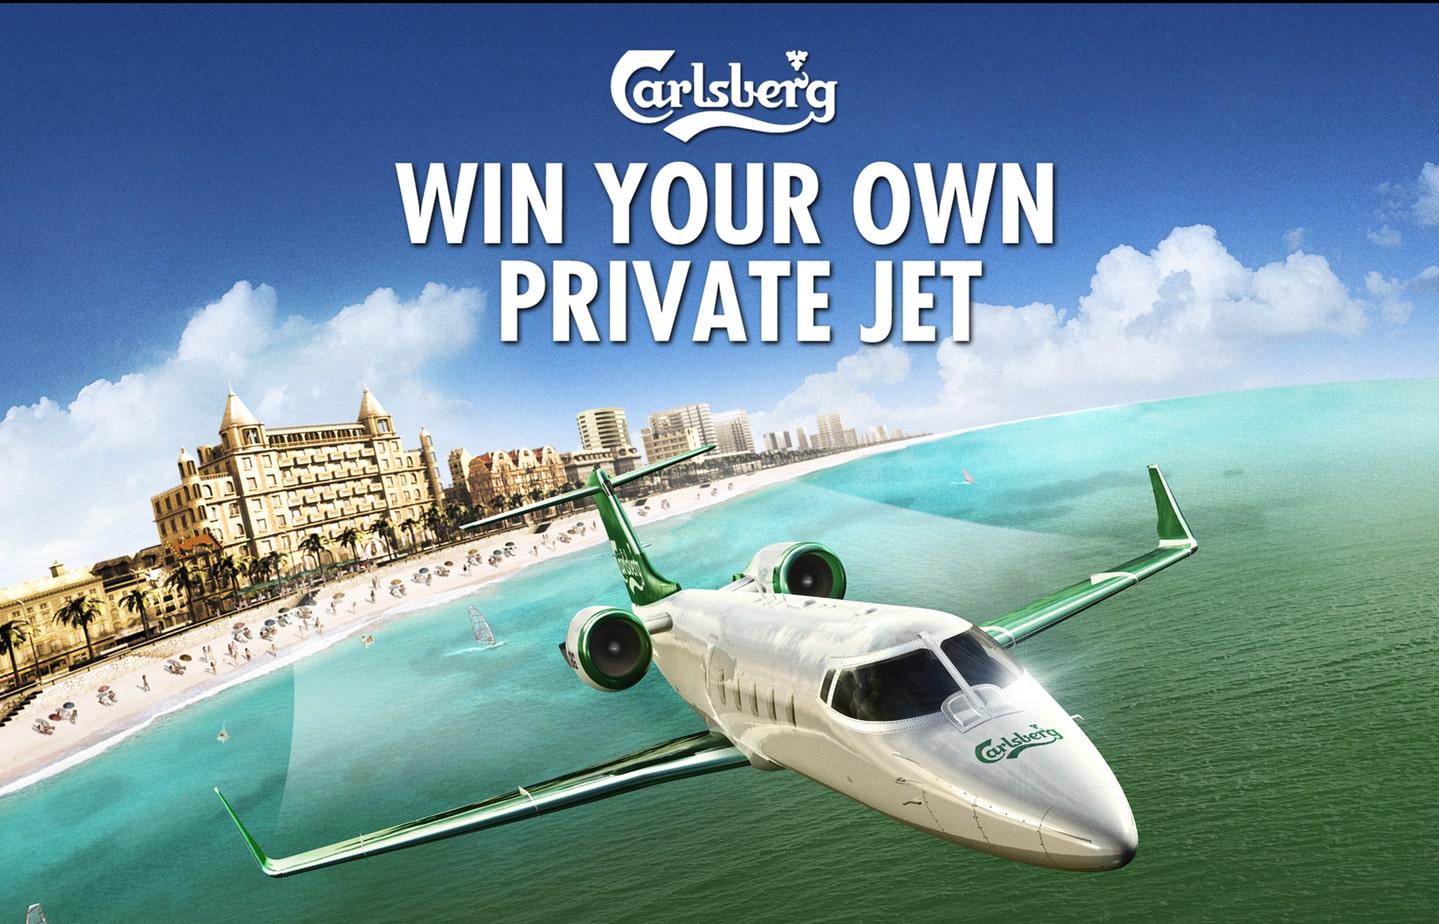 The Color Club - Carlsberg Learjet